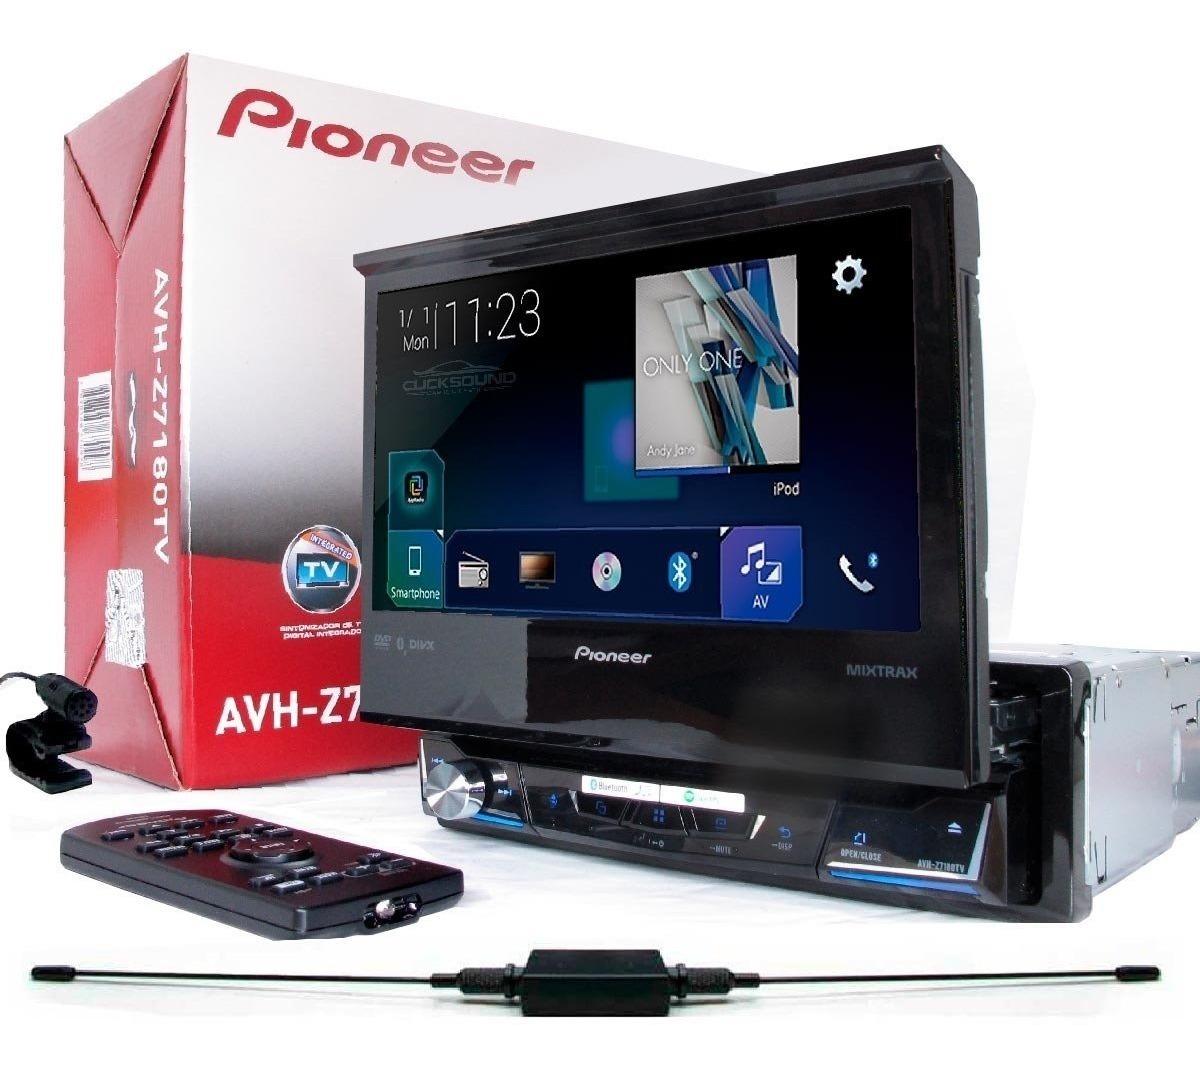 Dvd Pioneer Retratil Avh-z7180tv Spotify Waze Usb Bluetooth